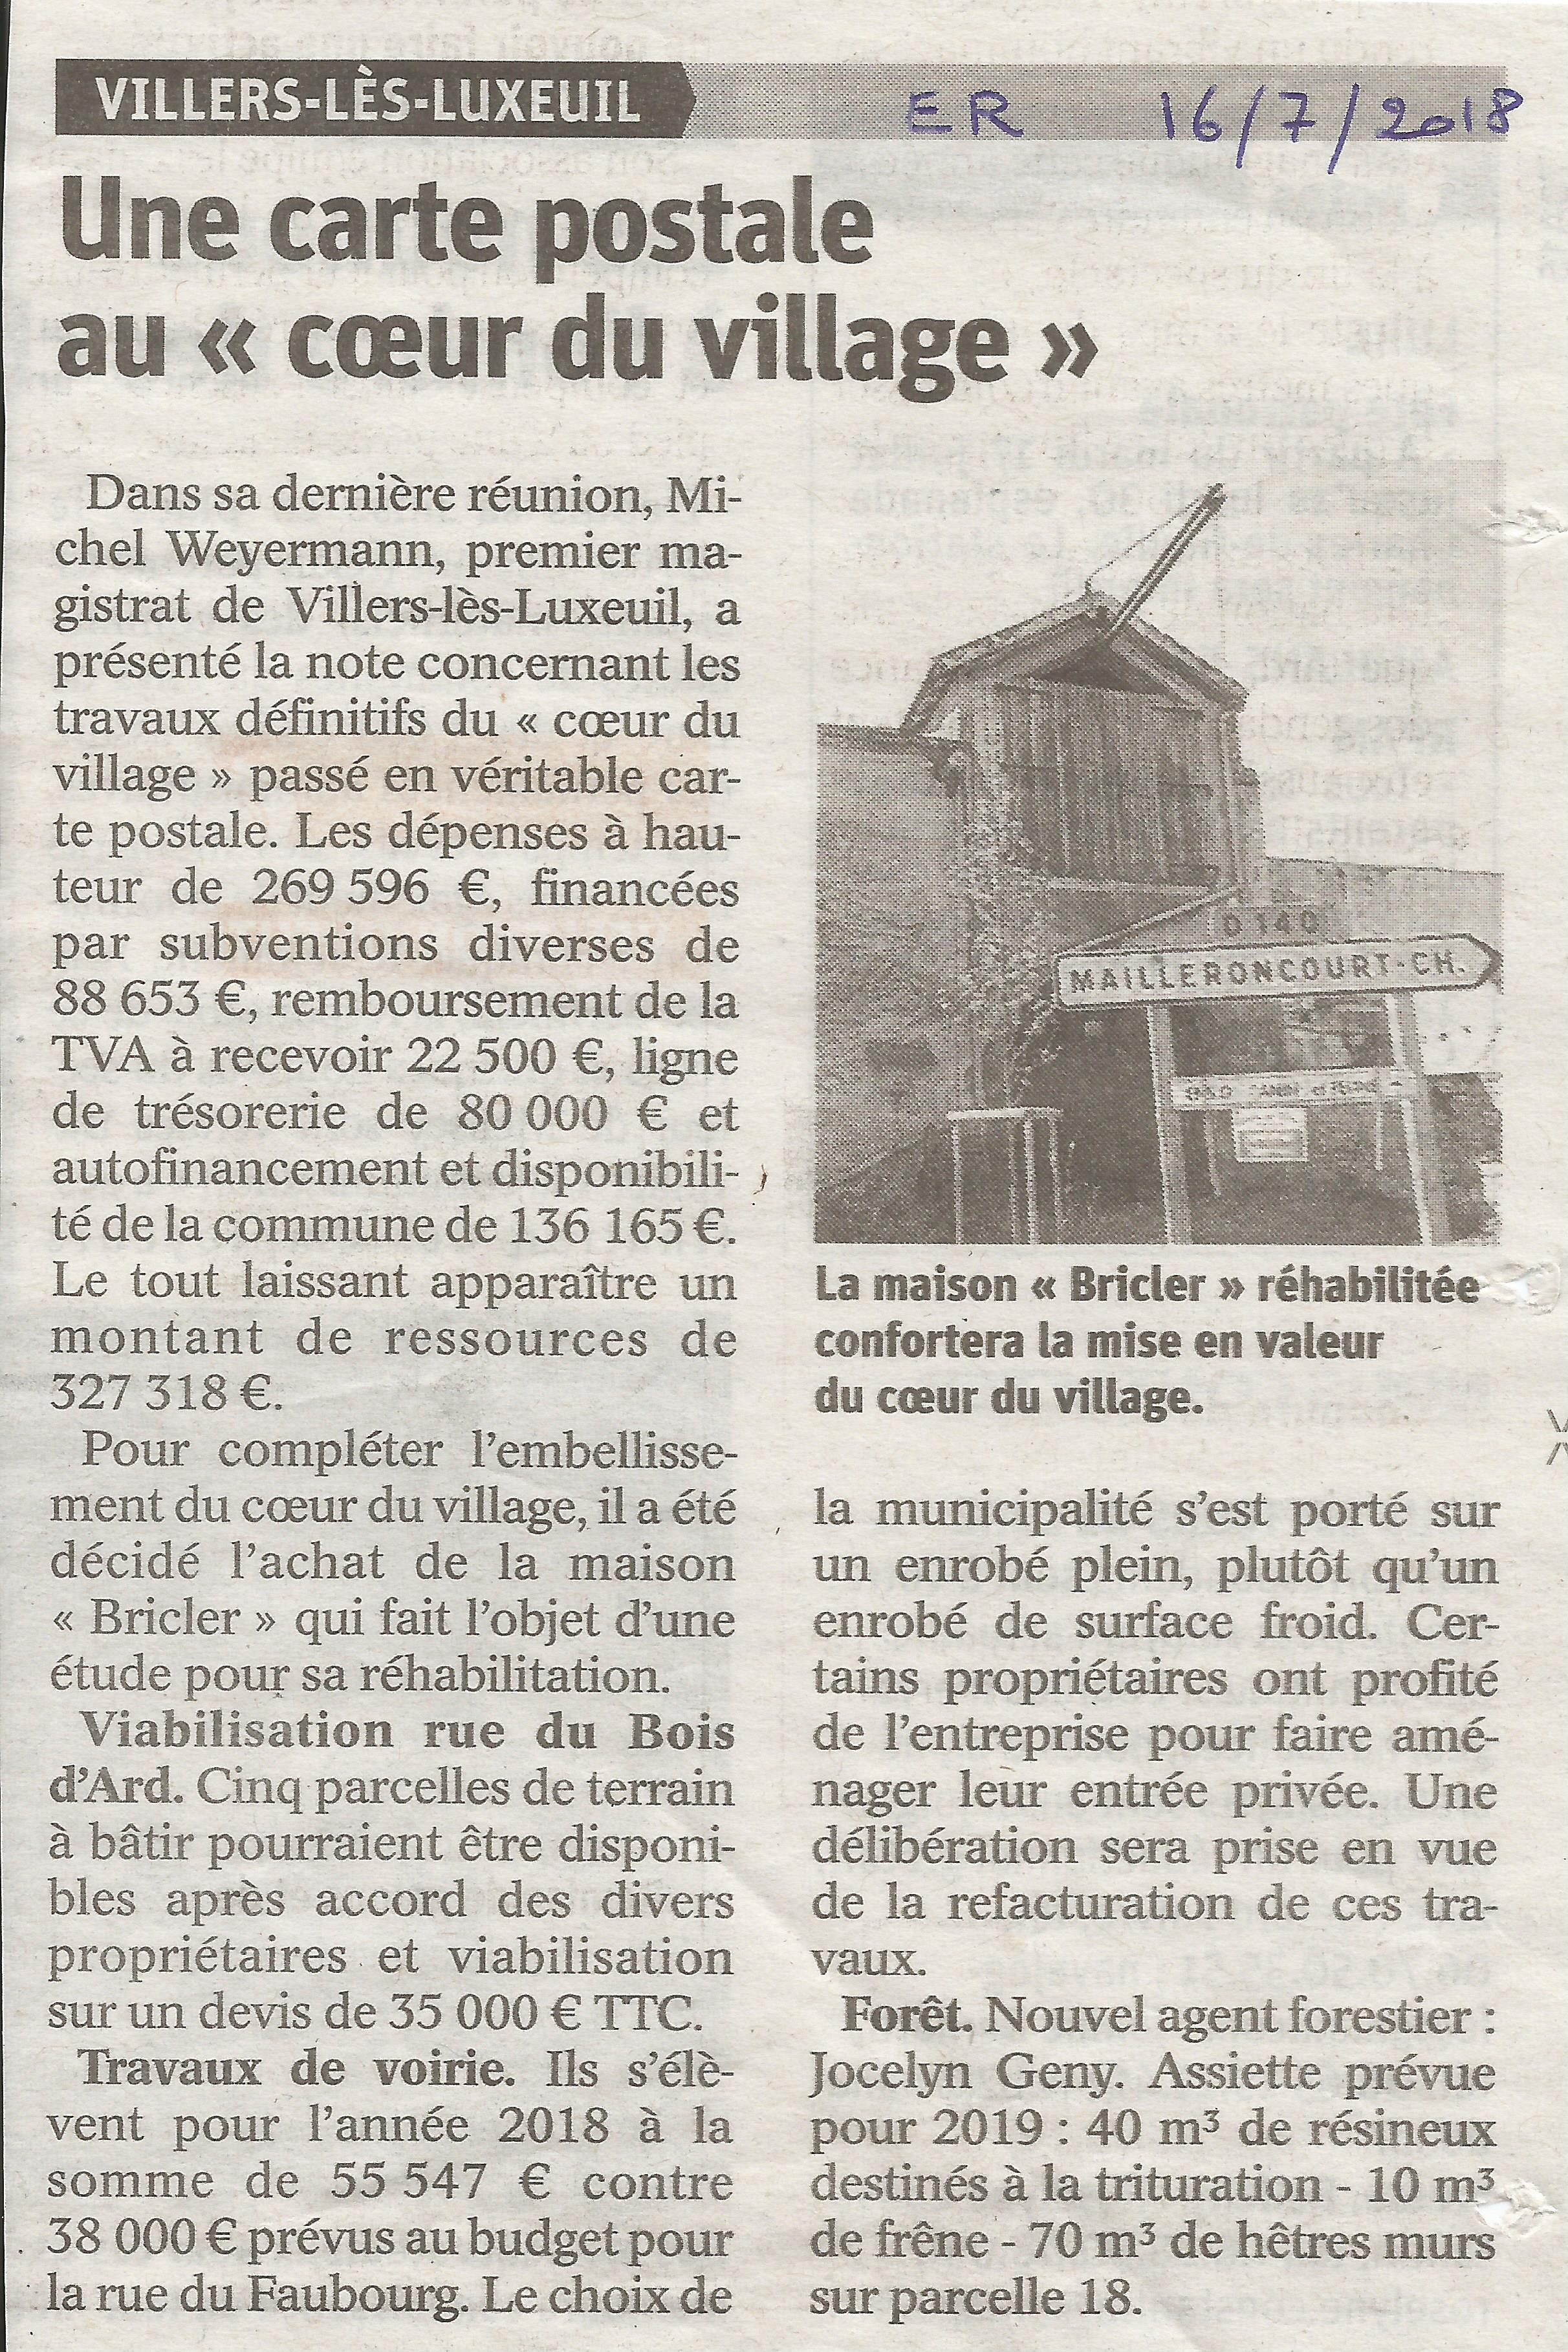 https://www.villers-les-luxeuil.com/projets/villers/files/images/2018_Mairie/Presse/2018_07_16.jpg